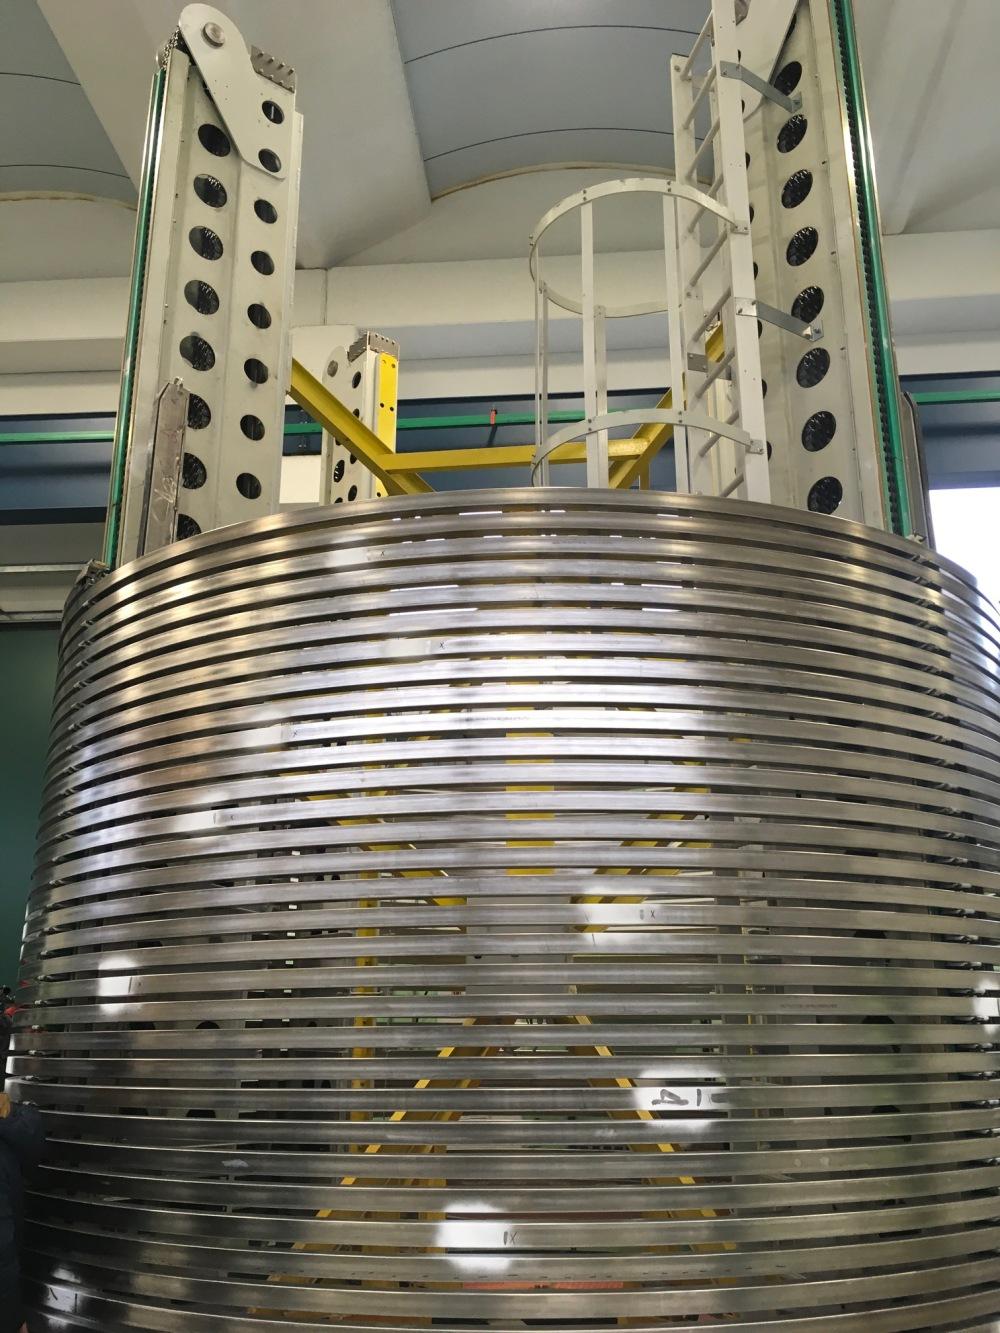 Chivasso_8nov_Cavi_superconduttori